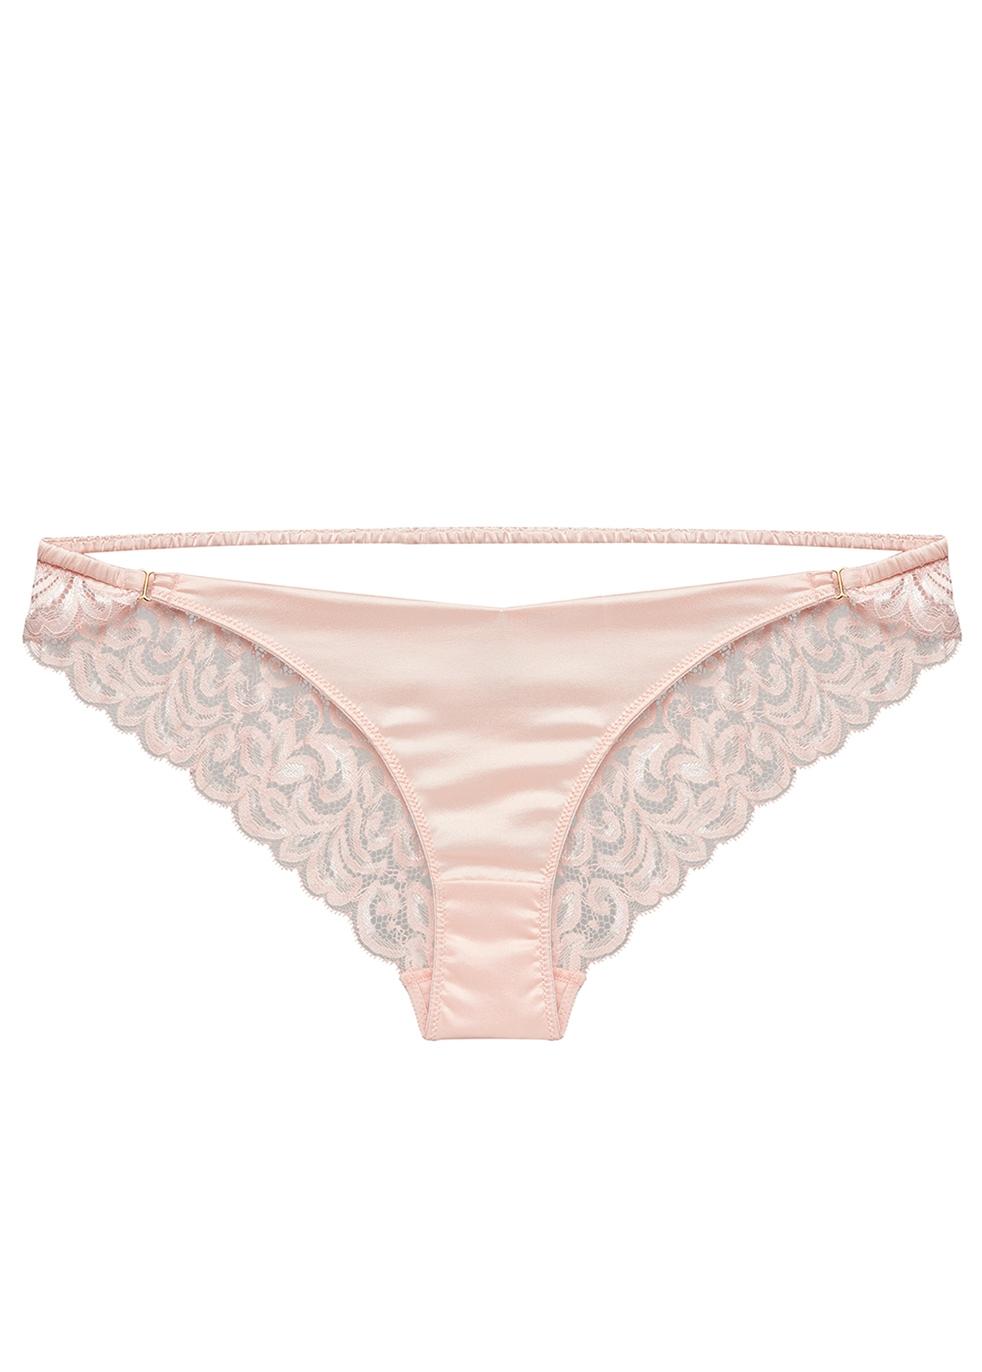 ADINA REAY 28DD TO 36G Adina Reay 28Dd To 36G Pru Ballet Pink Bikini Brief